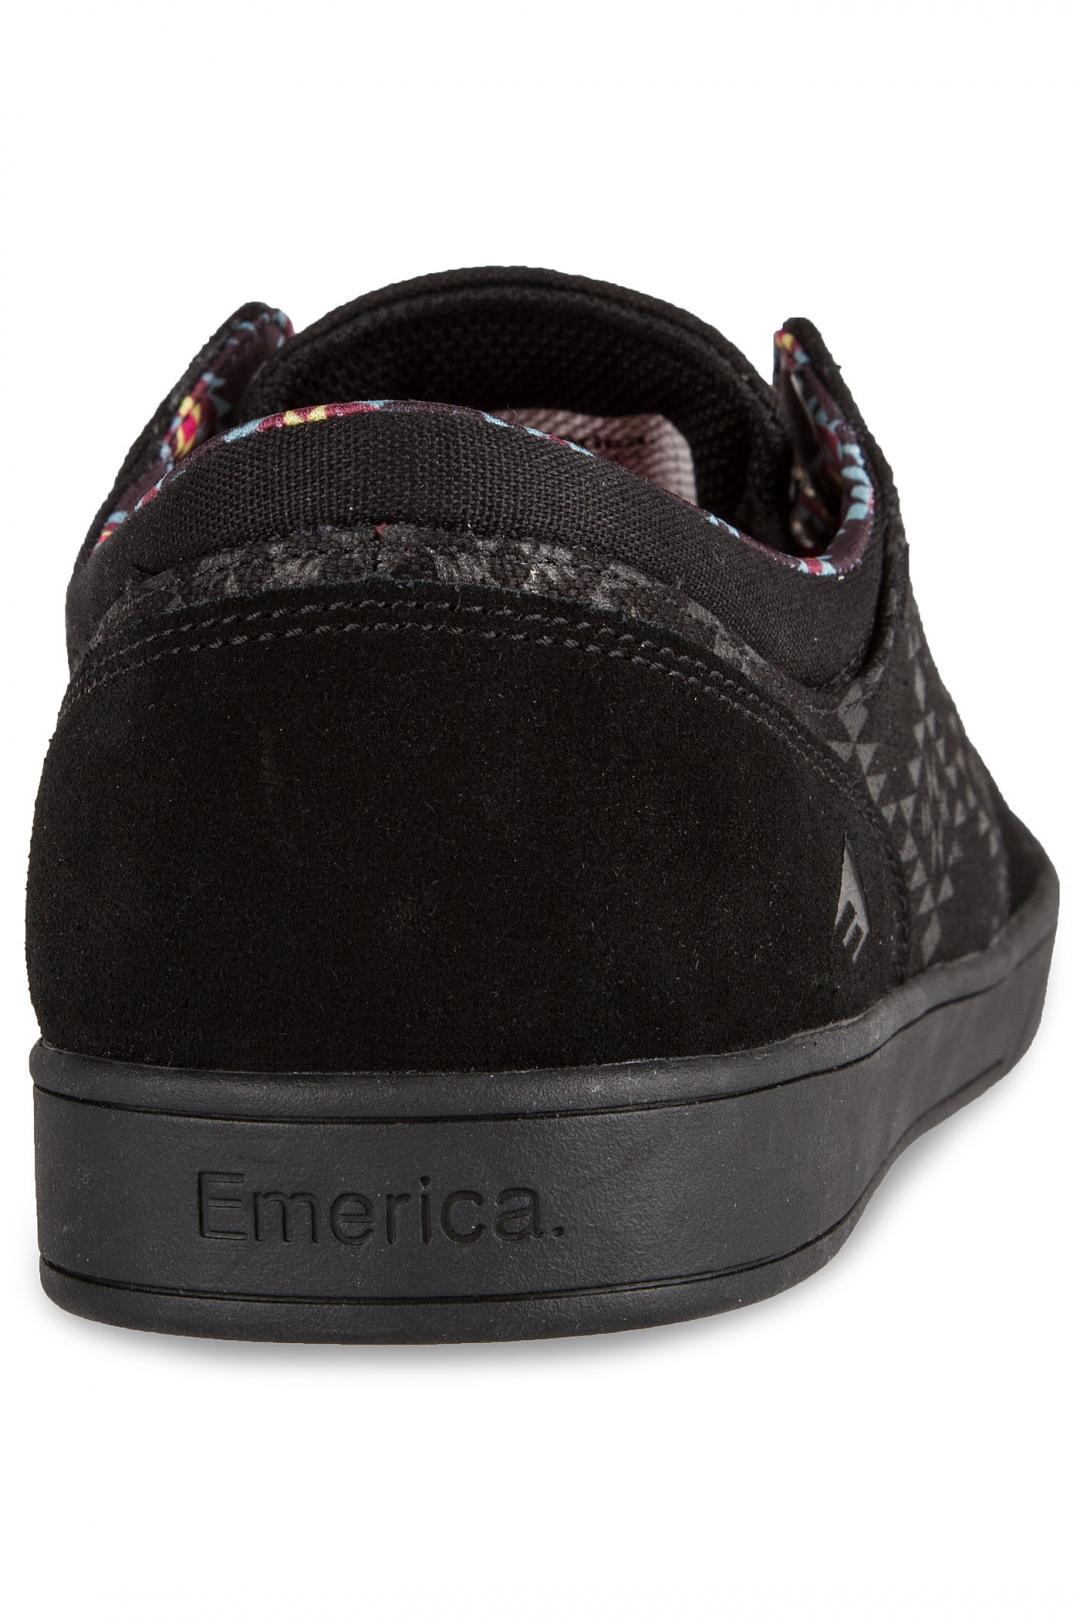 Uomo Emerica x Psockadelic The Figueroa black black print   Sneaker